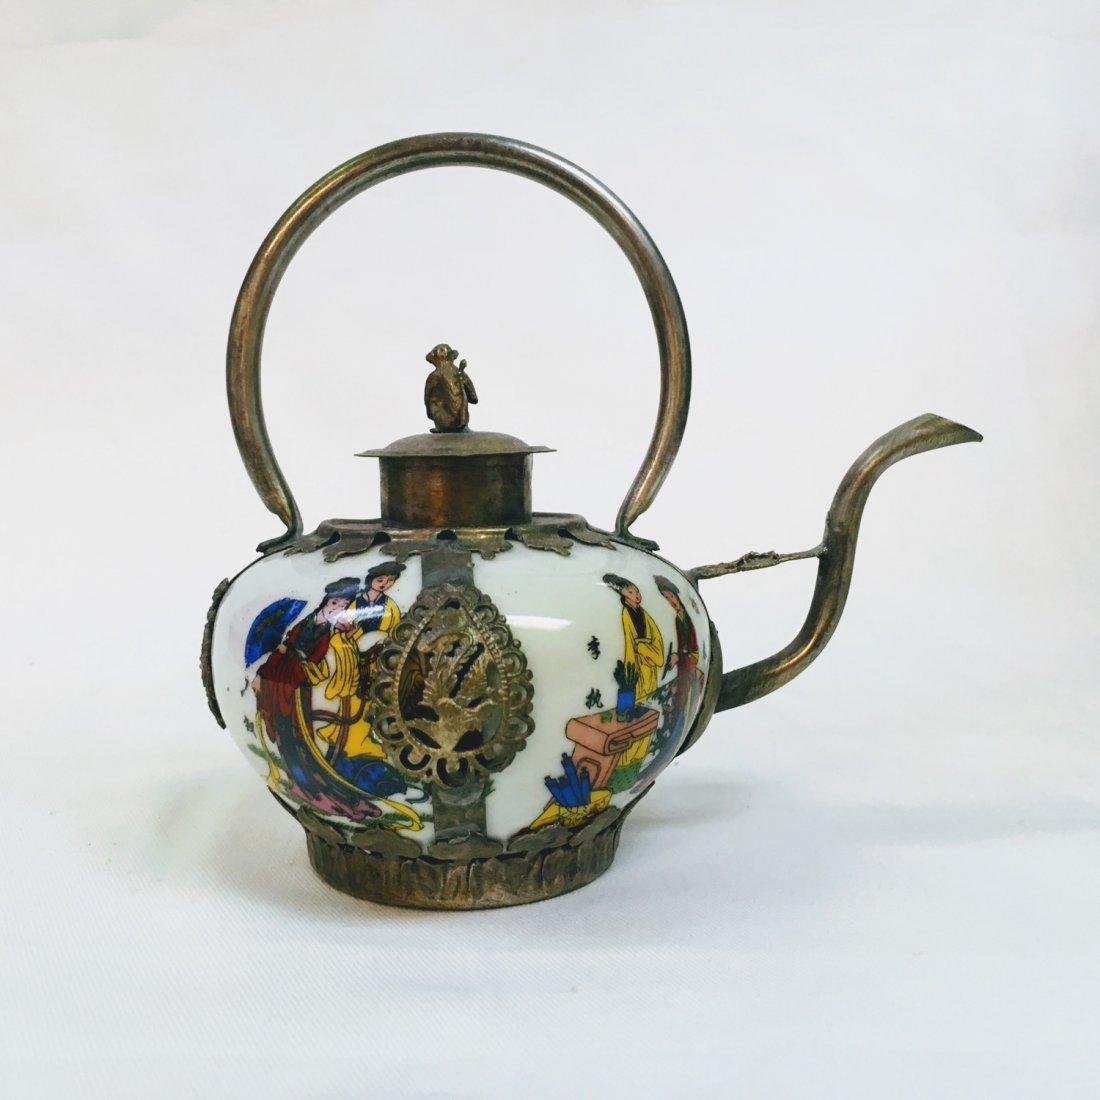 Chinese Vintage Porcelain & Metal Teapot - 3